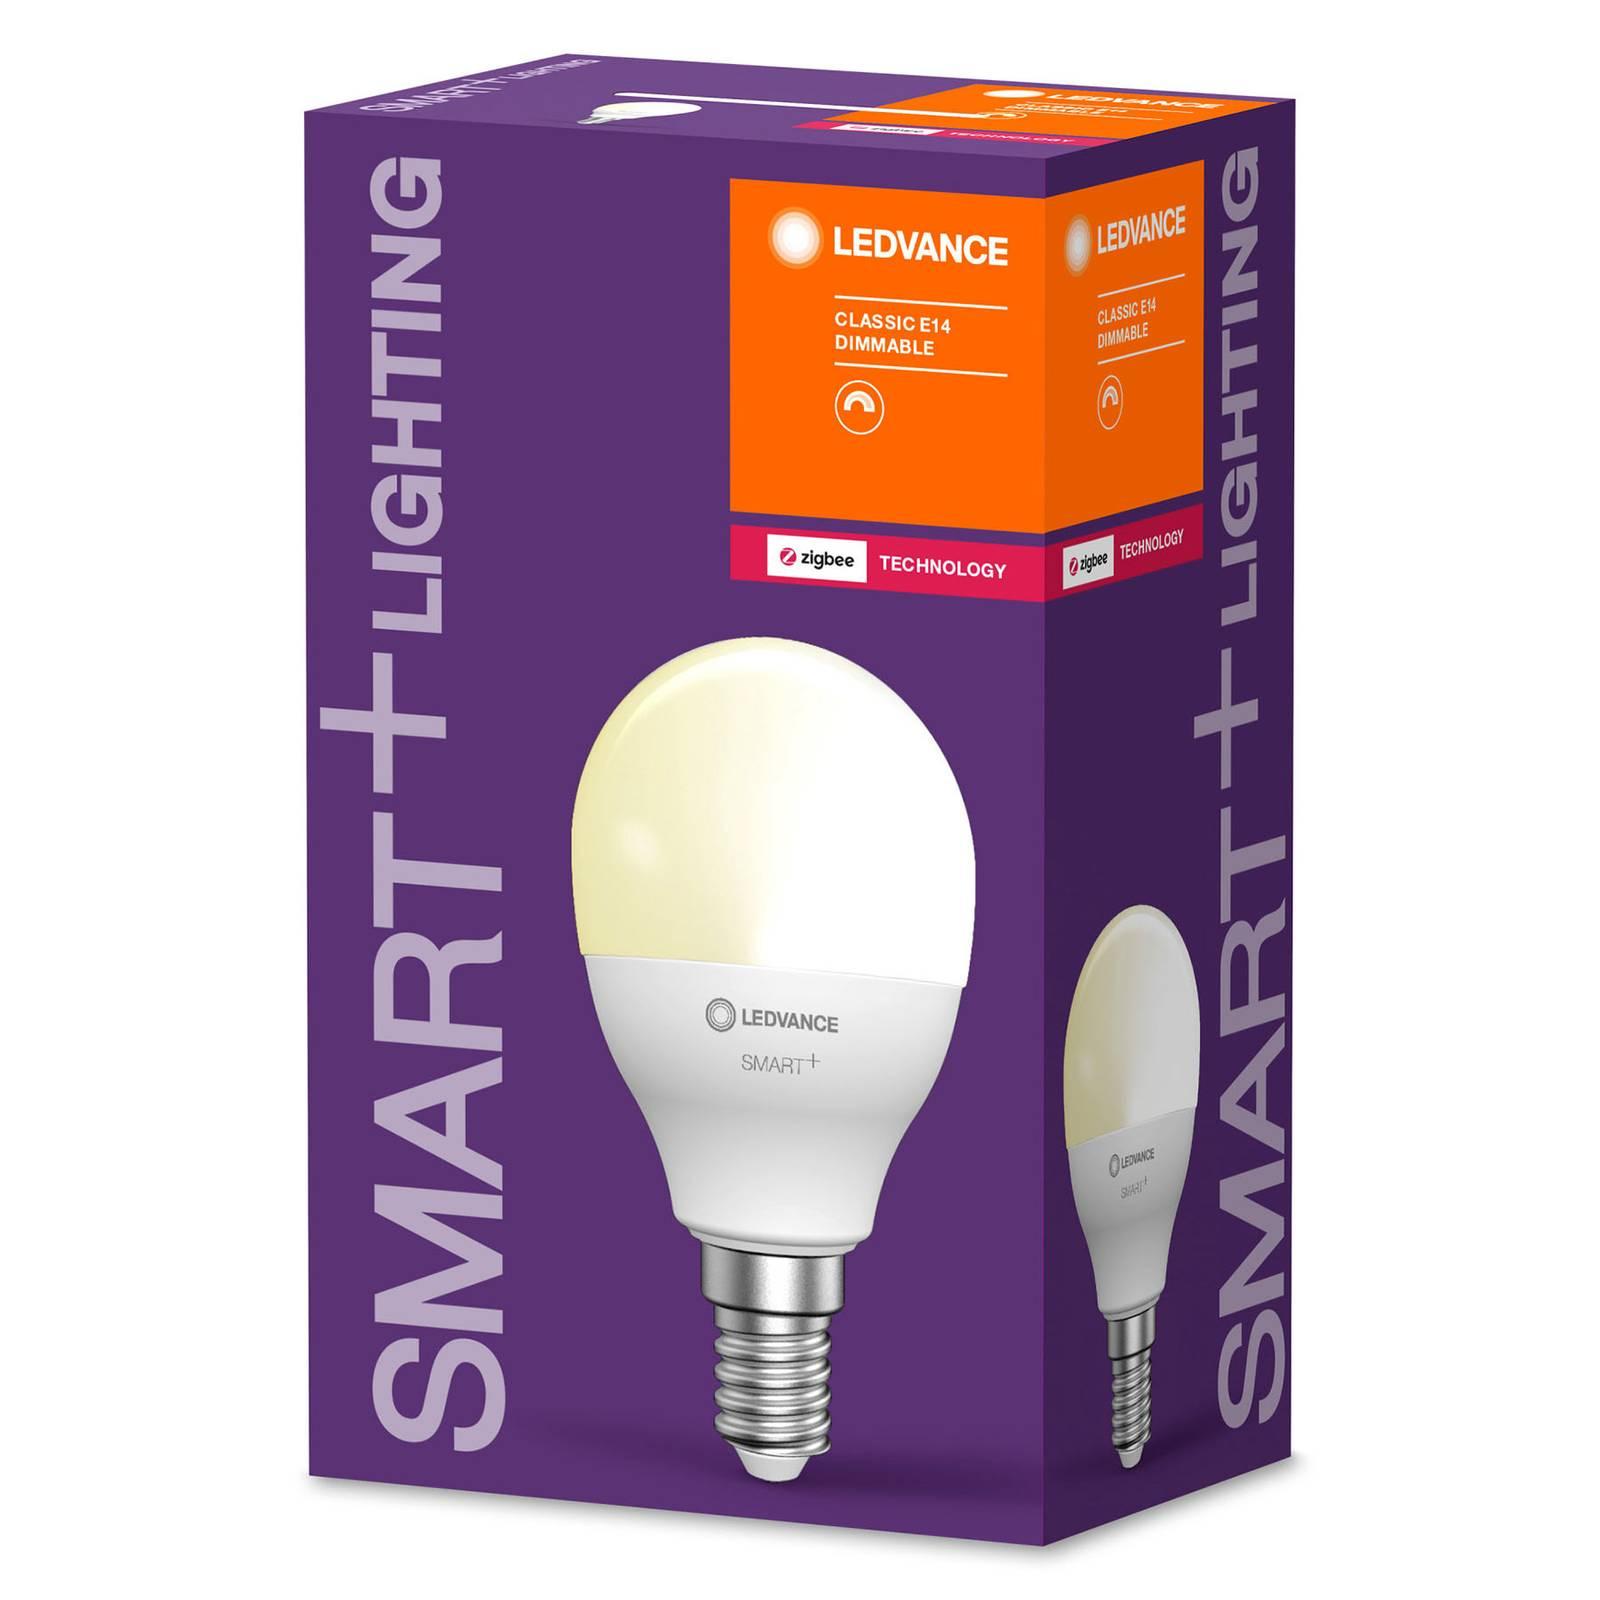 LEDVANCE SMART+ ZigBee E14 LED-pisara 5W 2 700 K